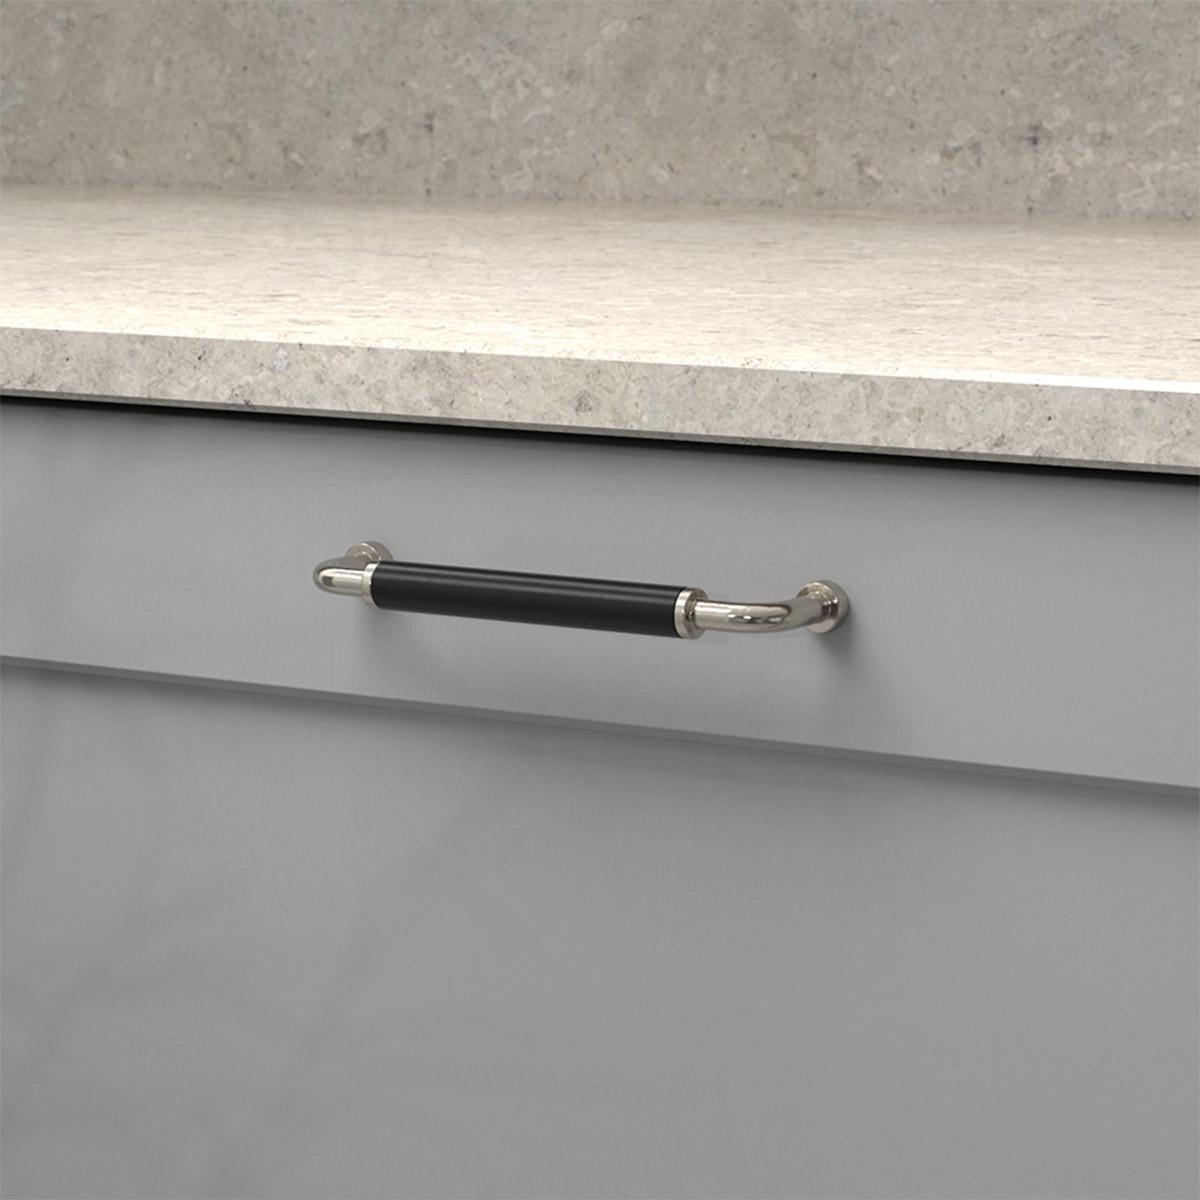 Handtag brohult m fornicklad svart 397045 11 cc 128 mm ncs s 4500 n kalksten spegellucka